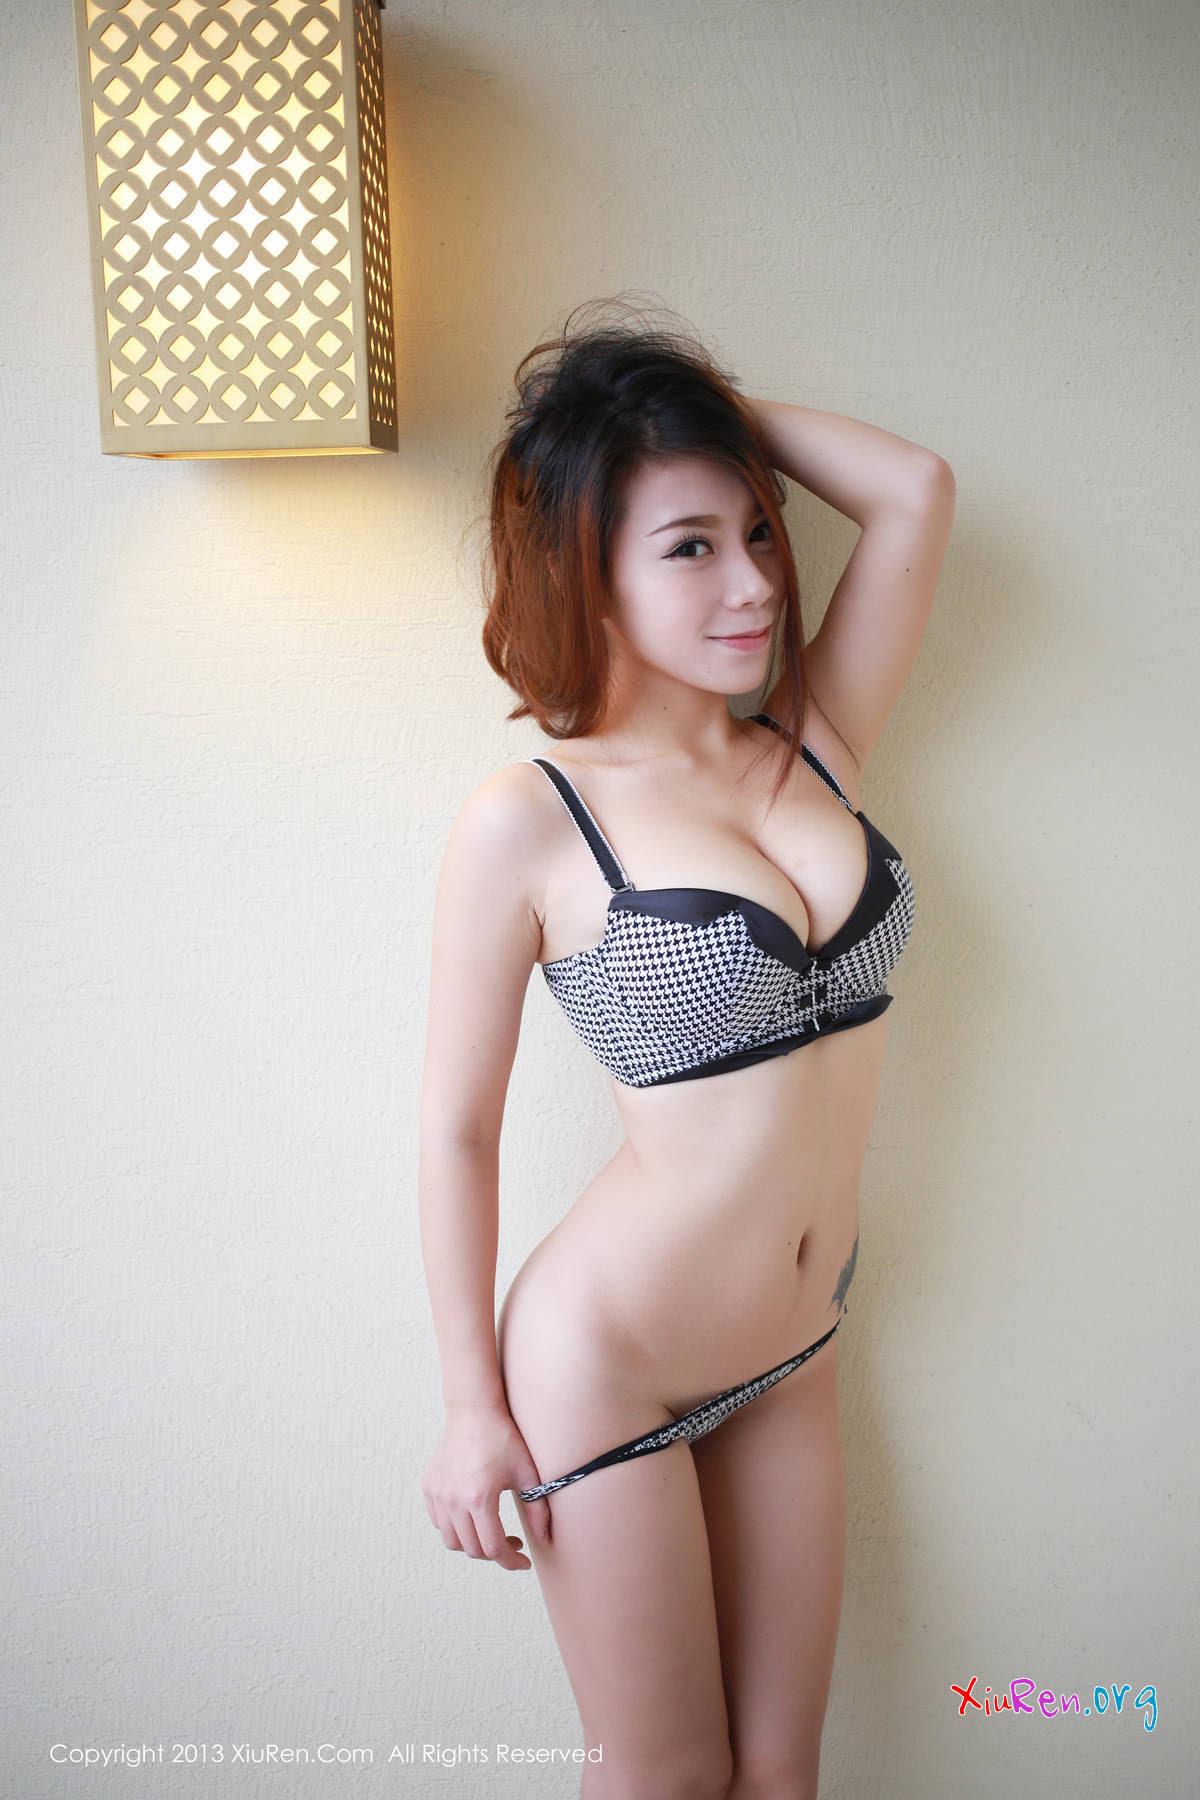 phimvu blog-XiuRen-N00058-vetiver-0021.jpg